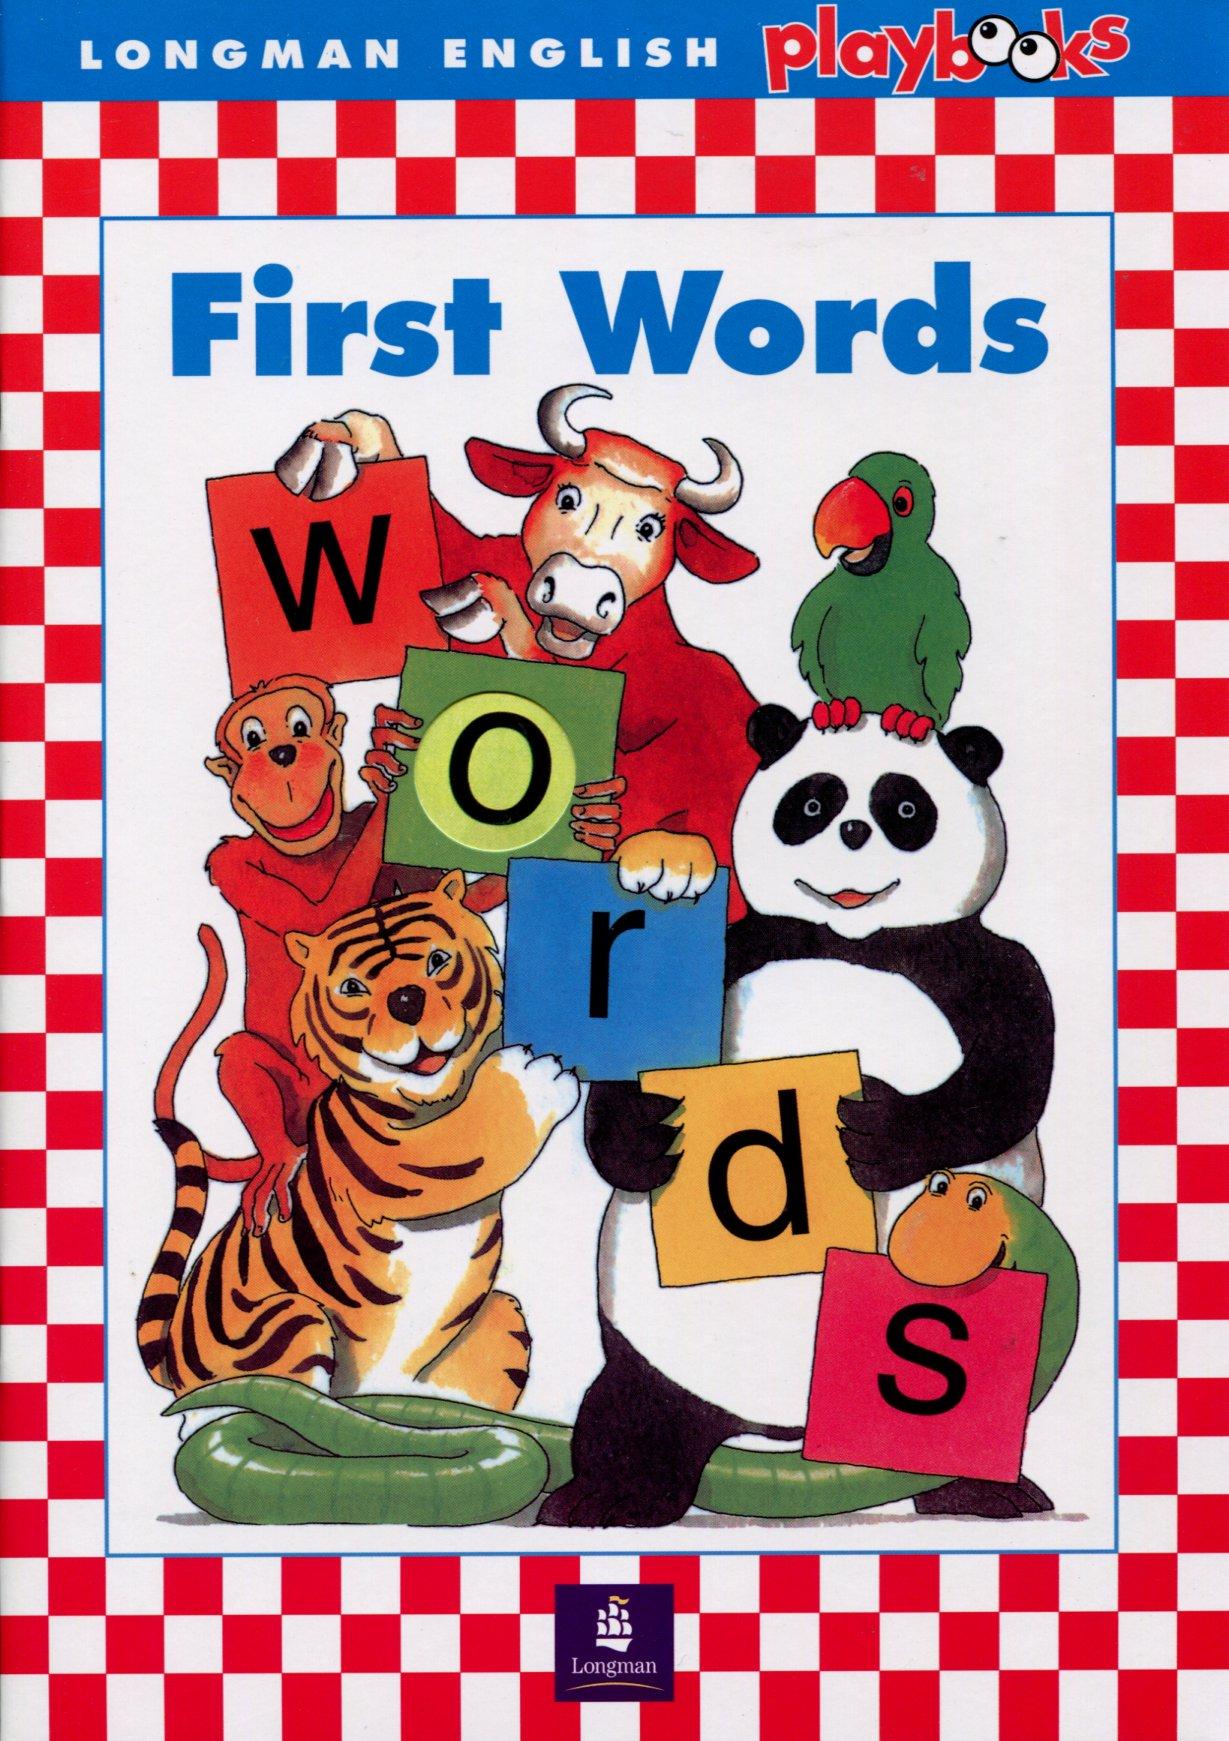 Longman English Playbooks: First Words